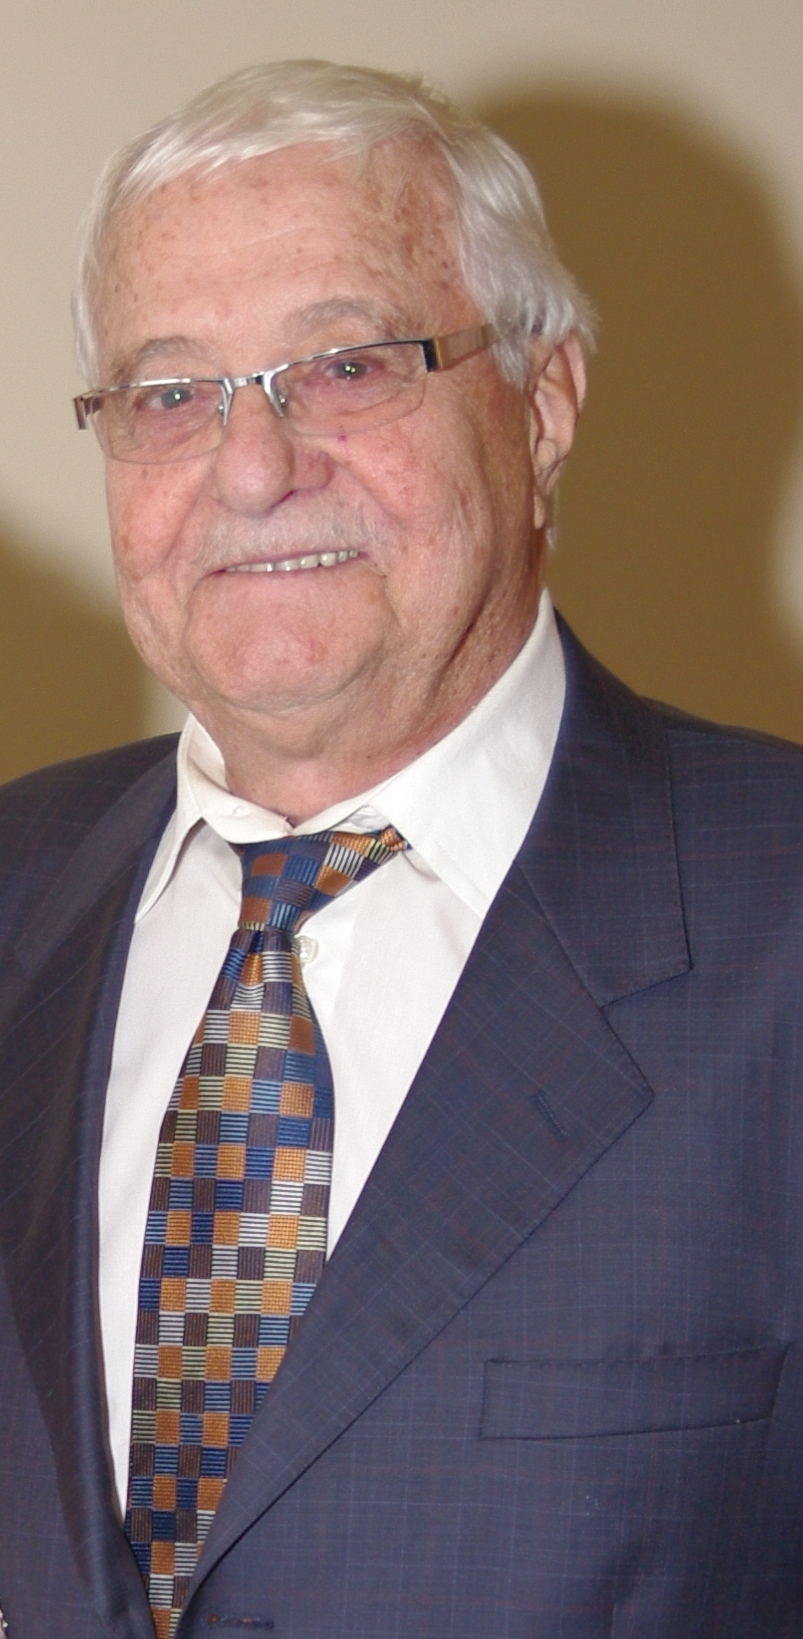 Joseph Arpin